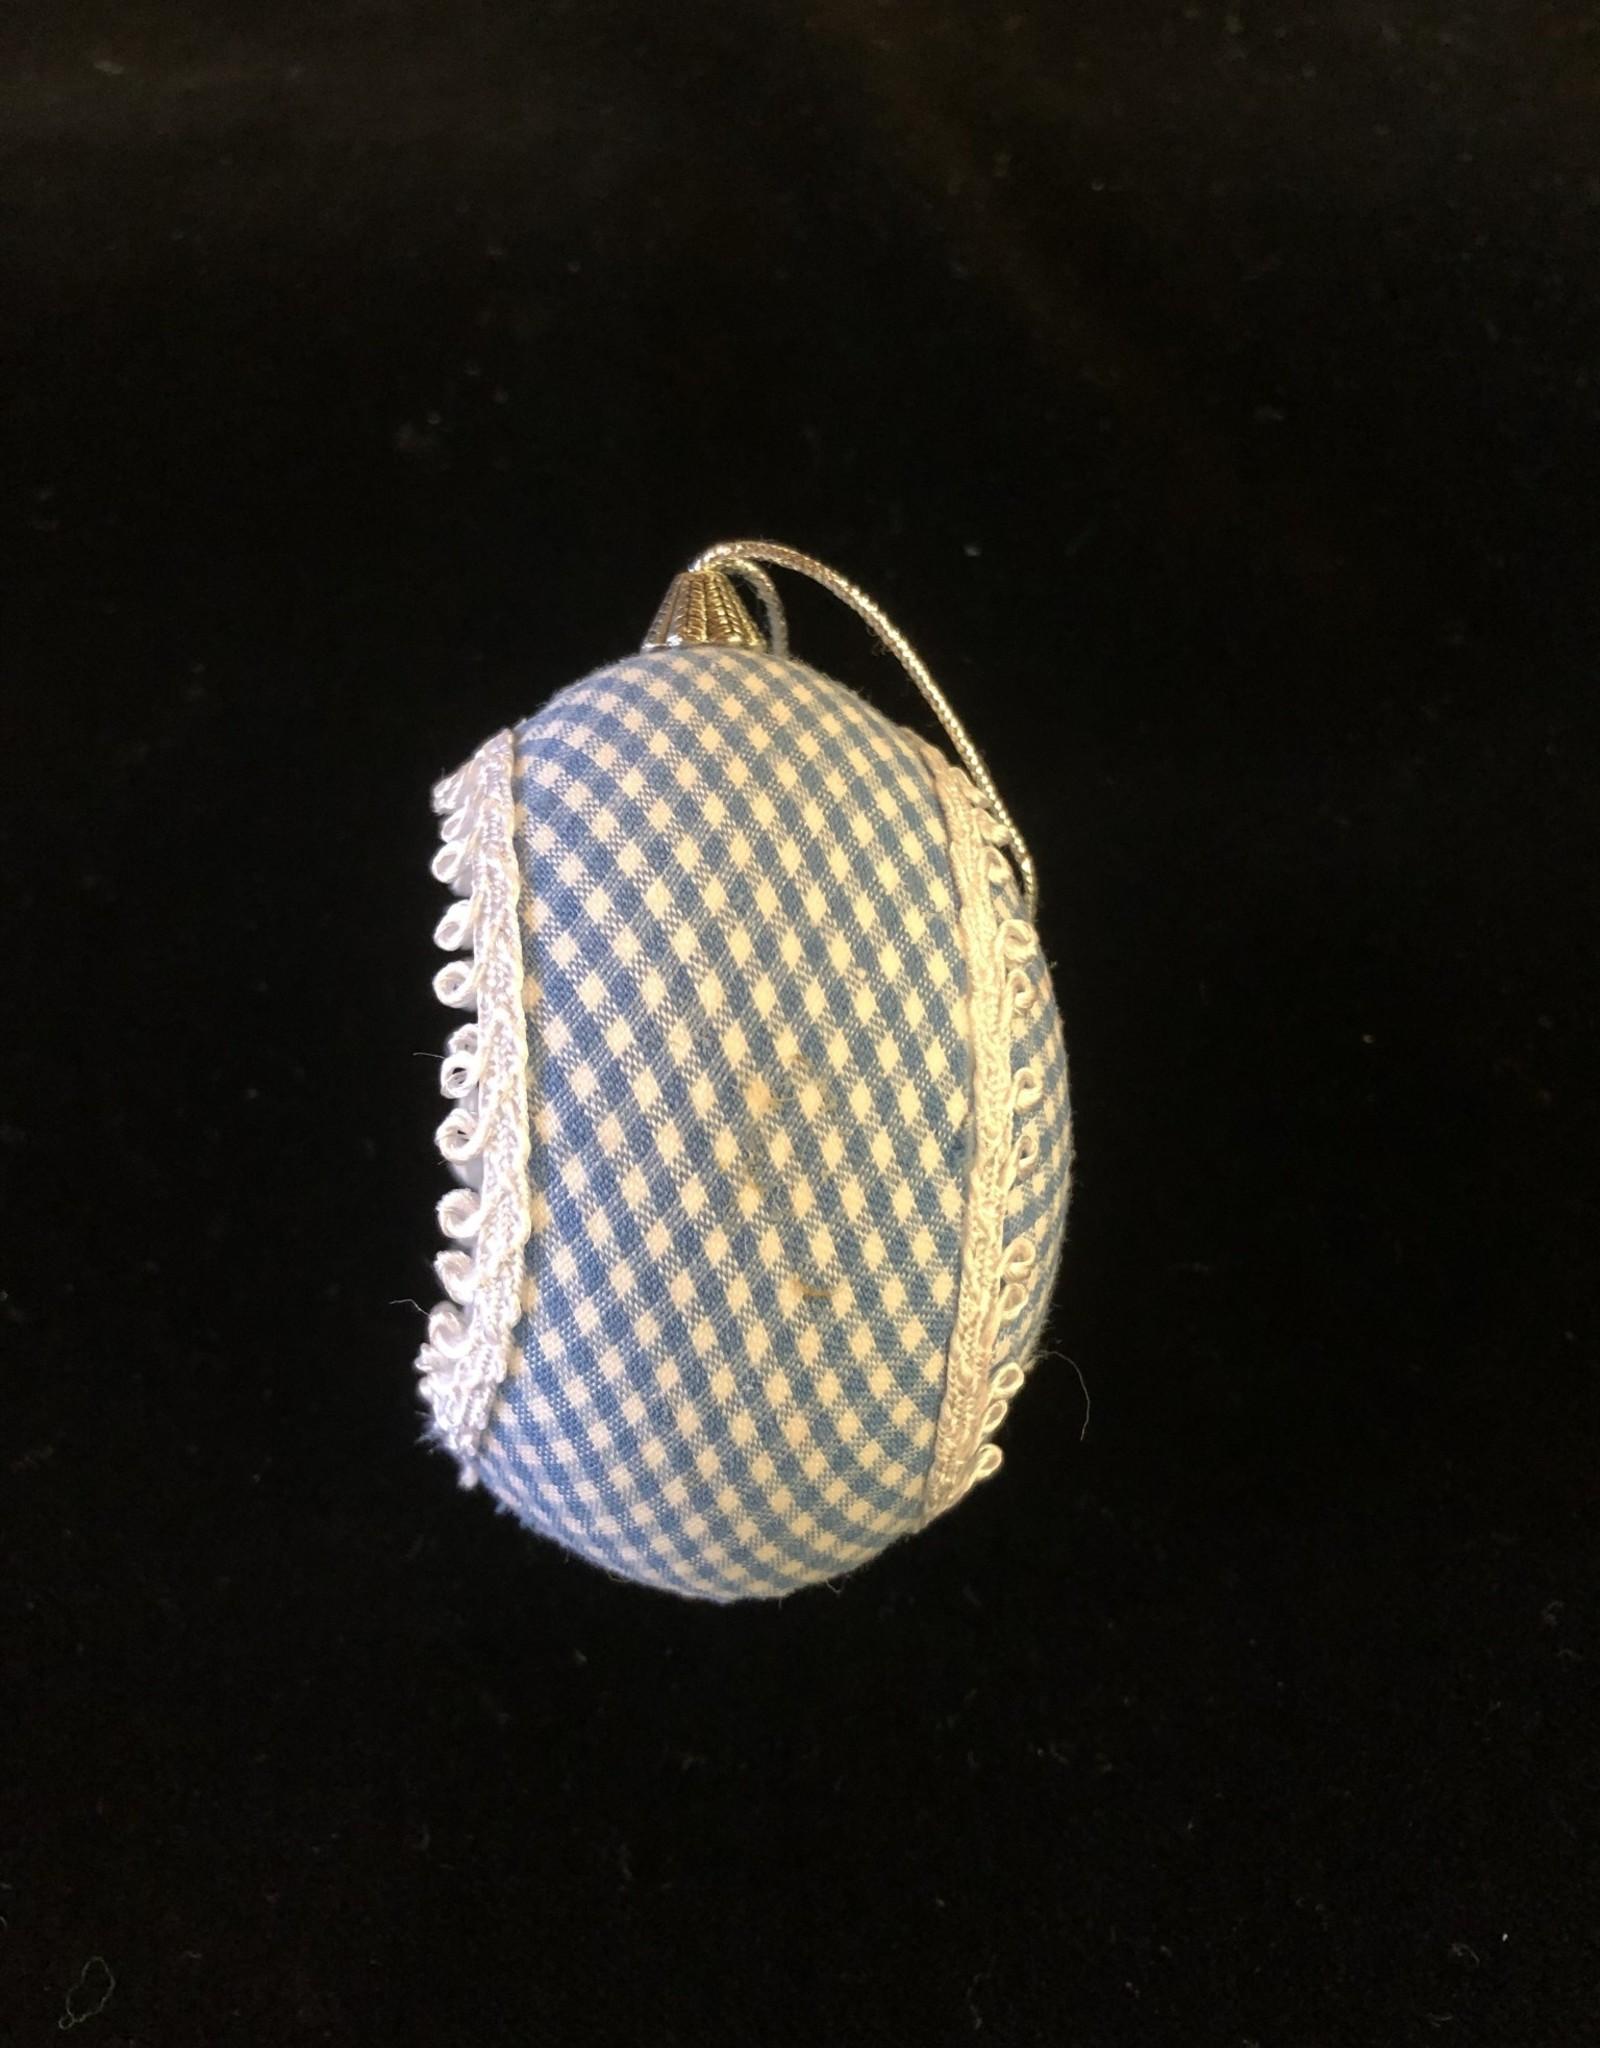 Ammi Brooks Alice/Rabbit Real Egg Ornament